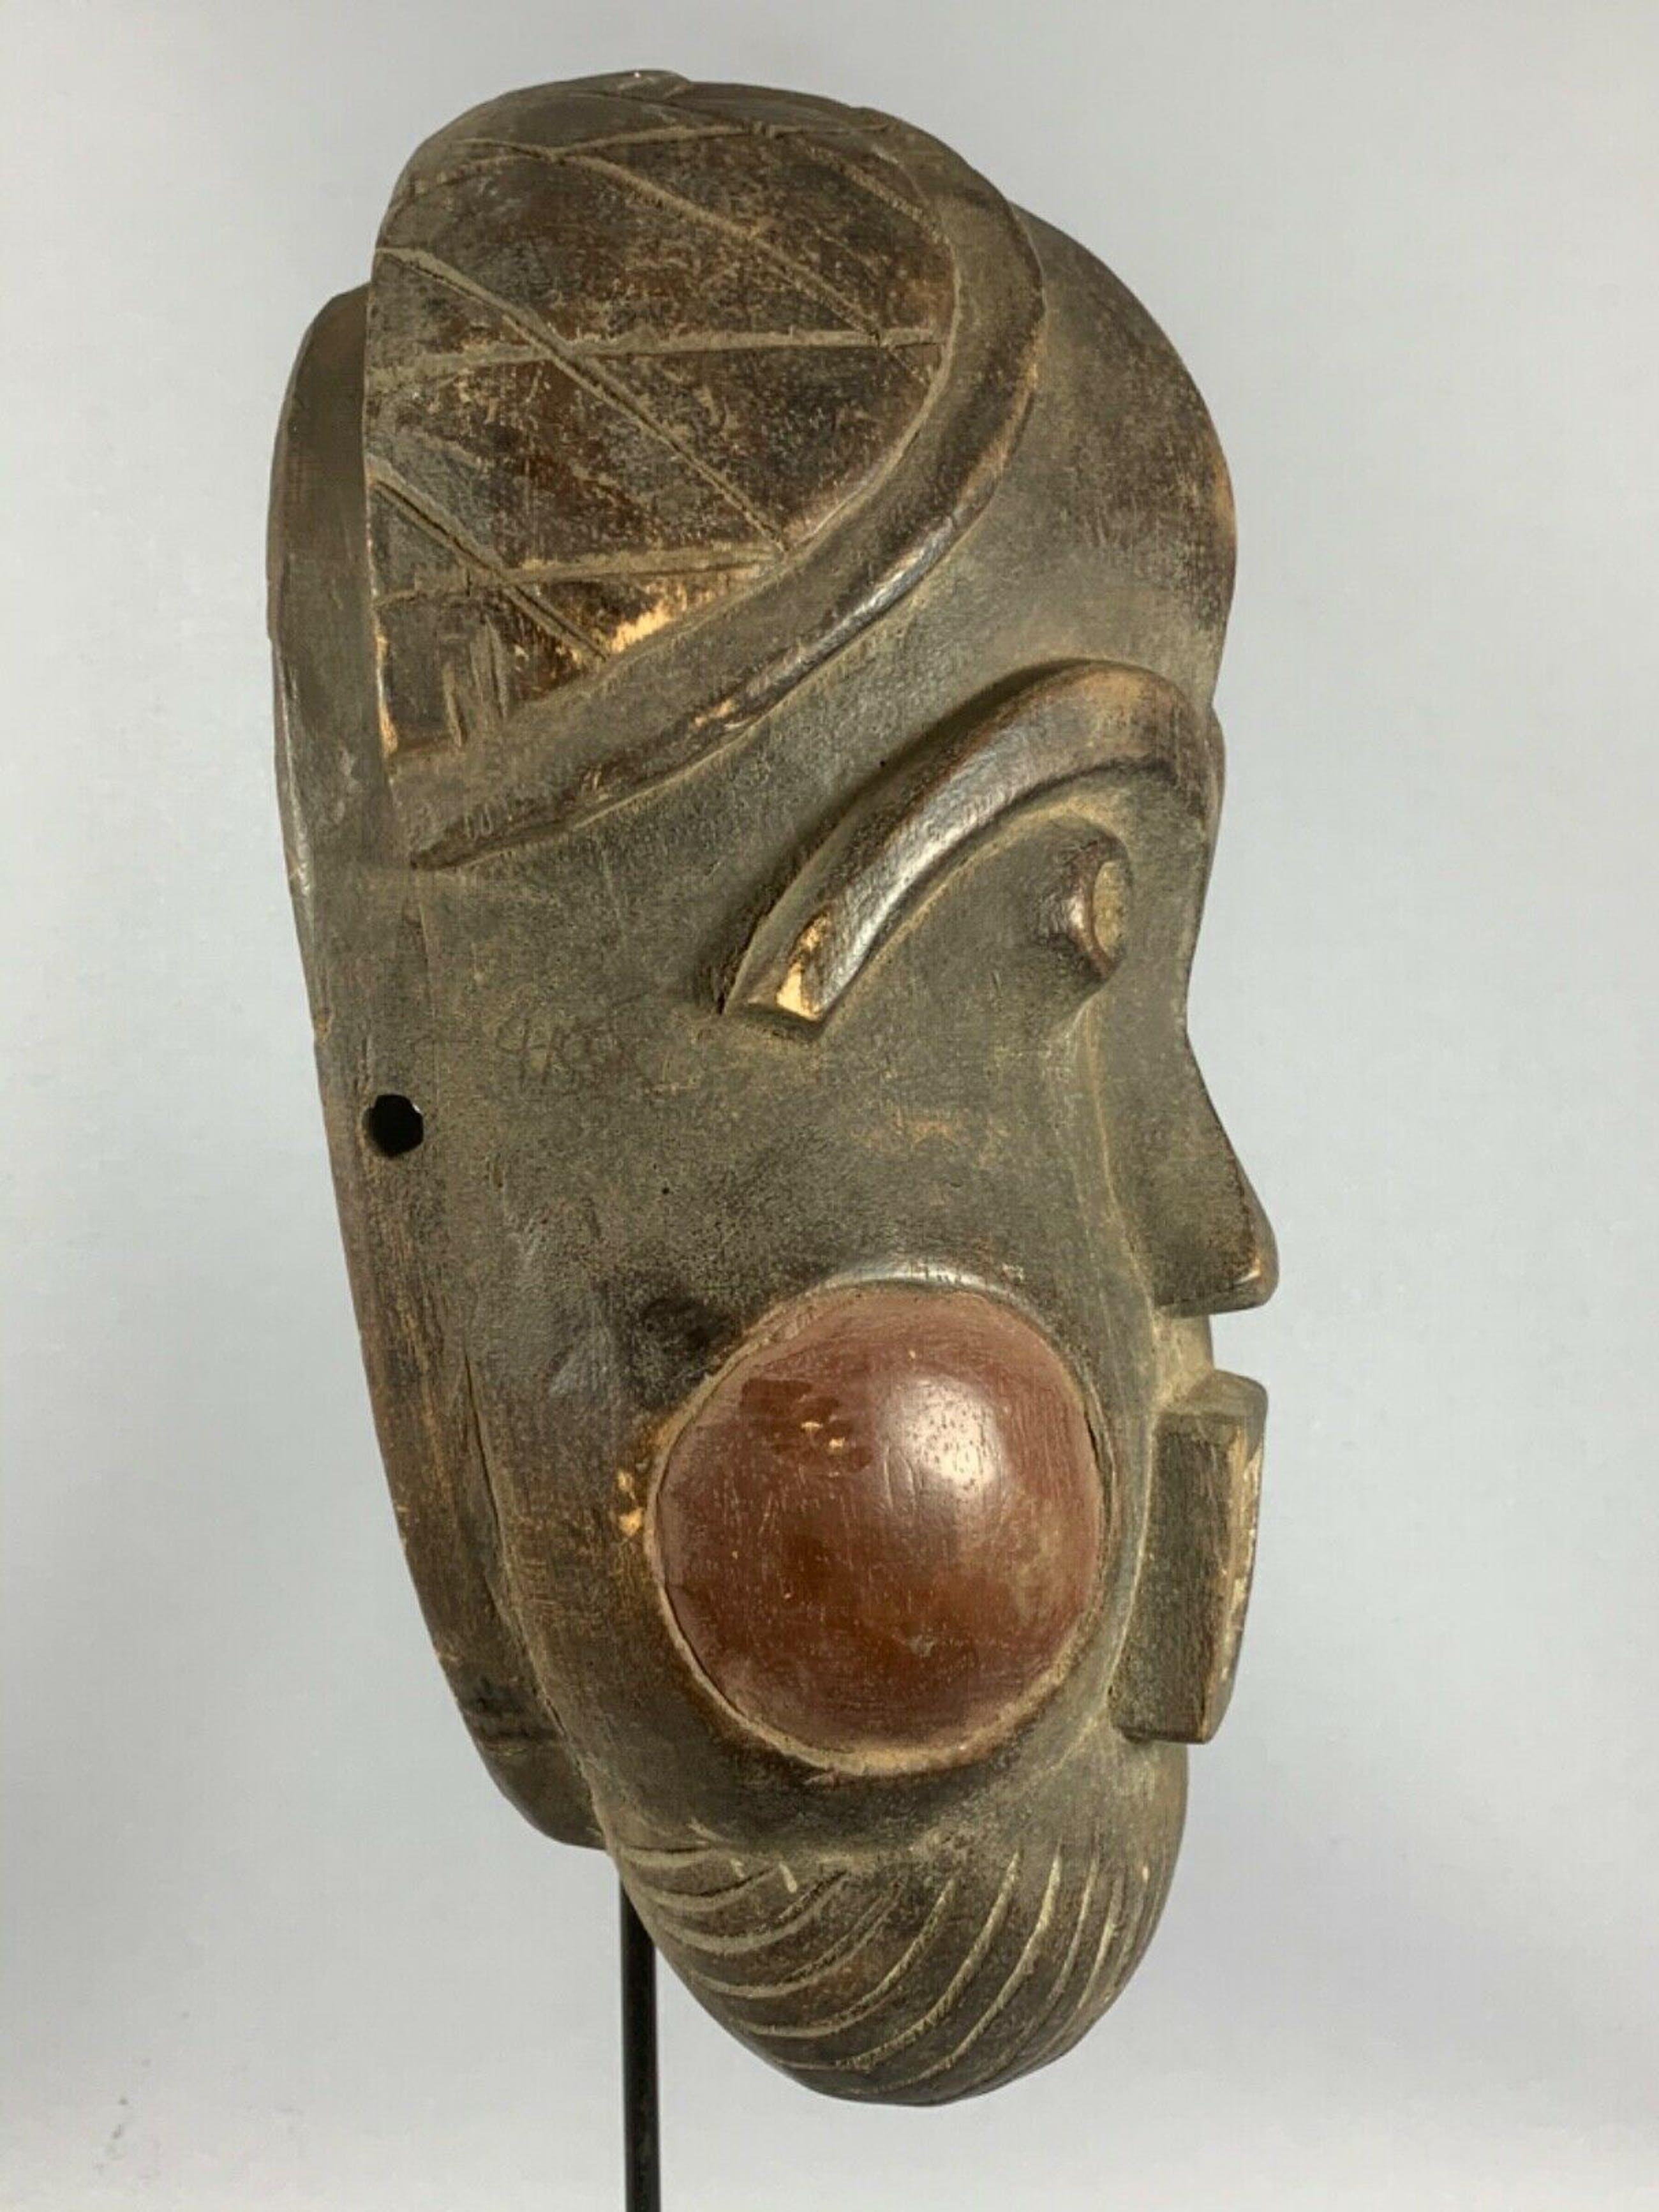 Mambila - 200375 - Rare & Old Tribal used African Mambila mask - Cameroon. kopen? Bied vanaf 45!